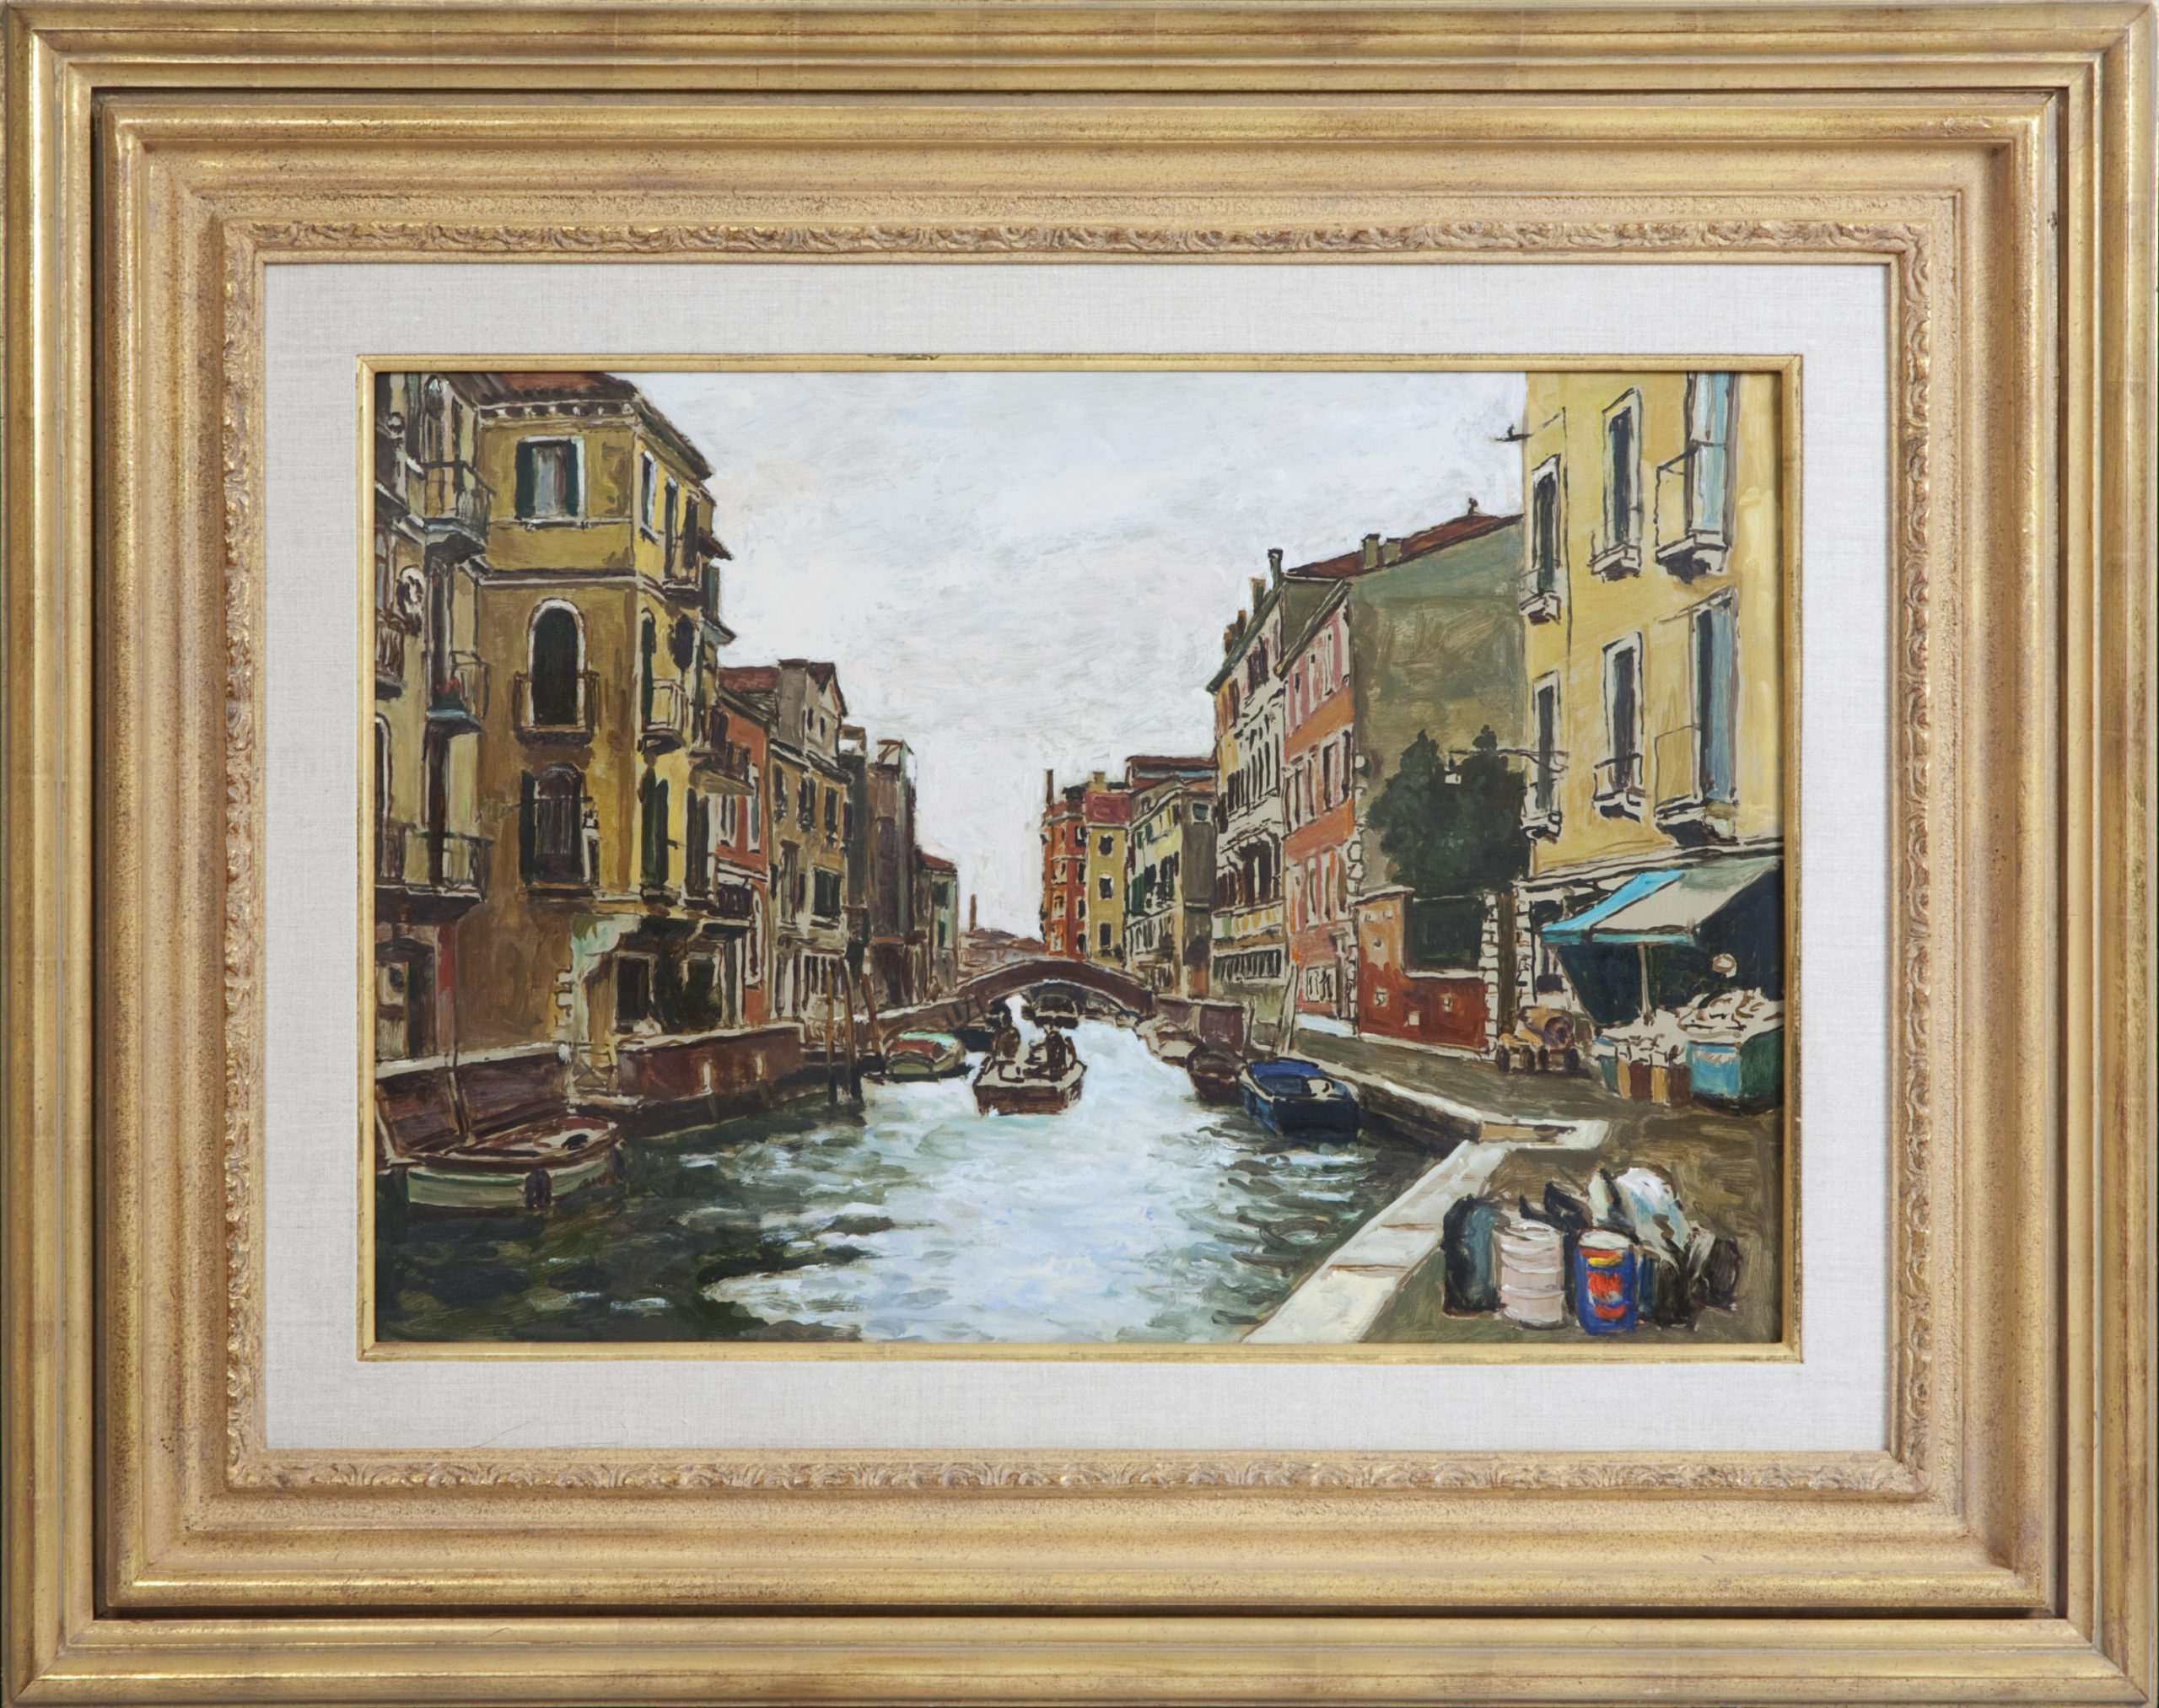 037 Venice unf - Oil on Masonite - 26 x 17.5 - Frame: 38.5 x 30.5 x 2.5